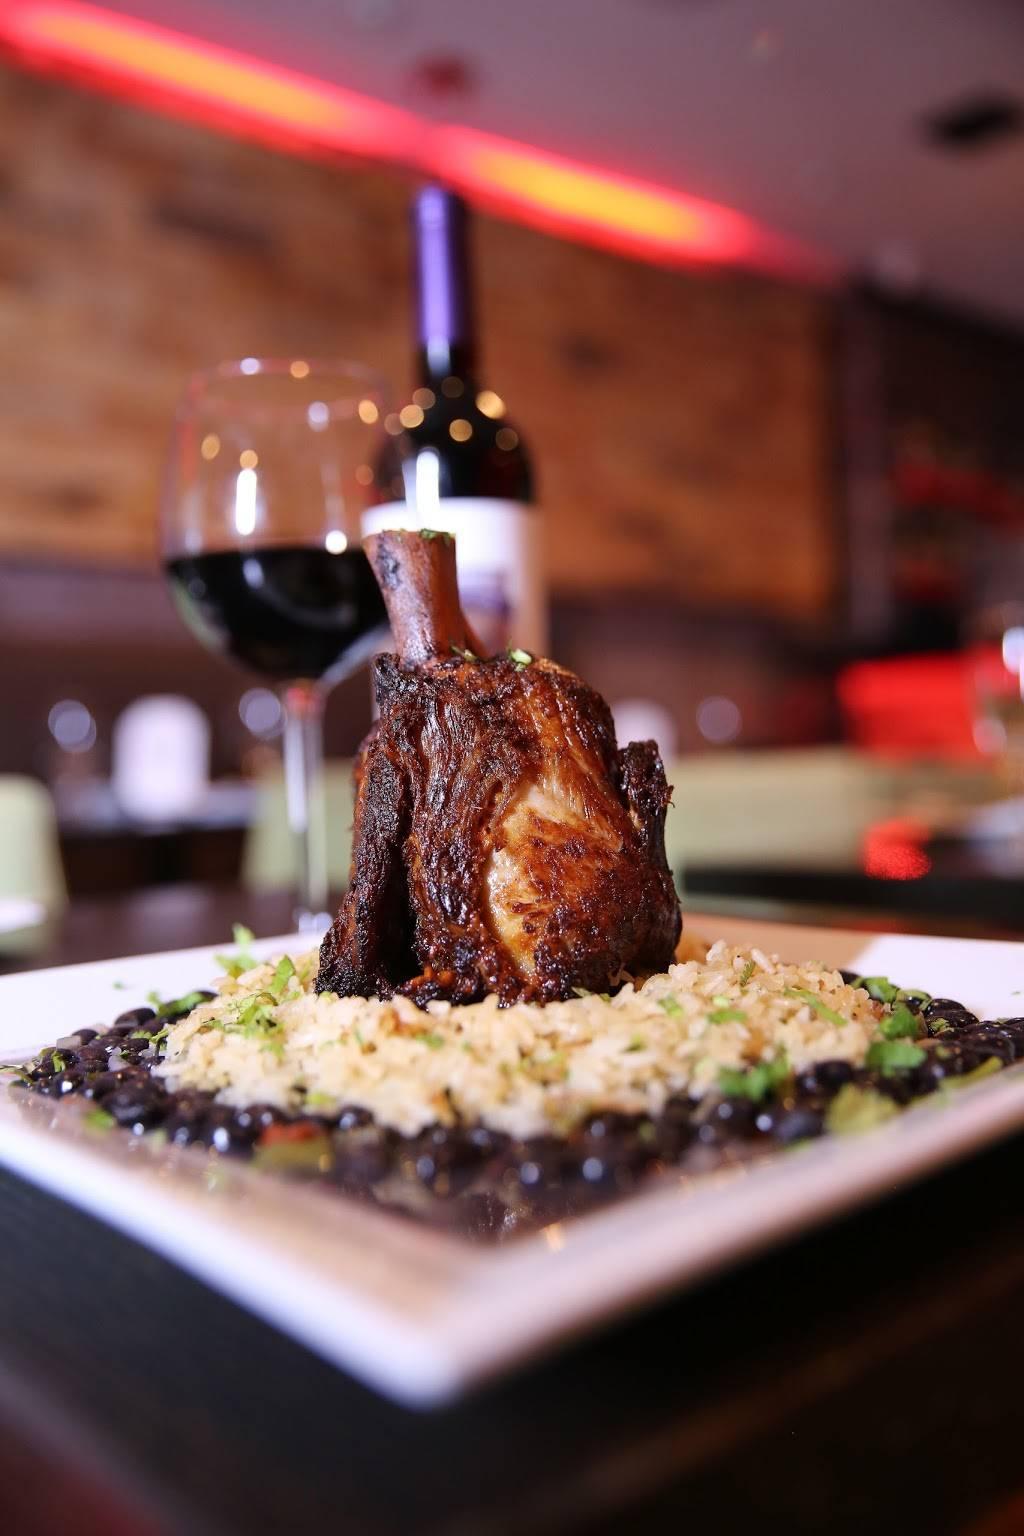 Social 59 Eatery & Lounge | restaurant | 512 59th St, West New York, NJ 07093, USA | 2017515999 OR +1 201-751-5999